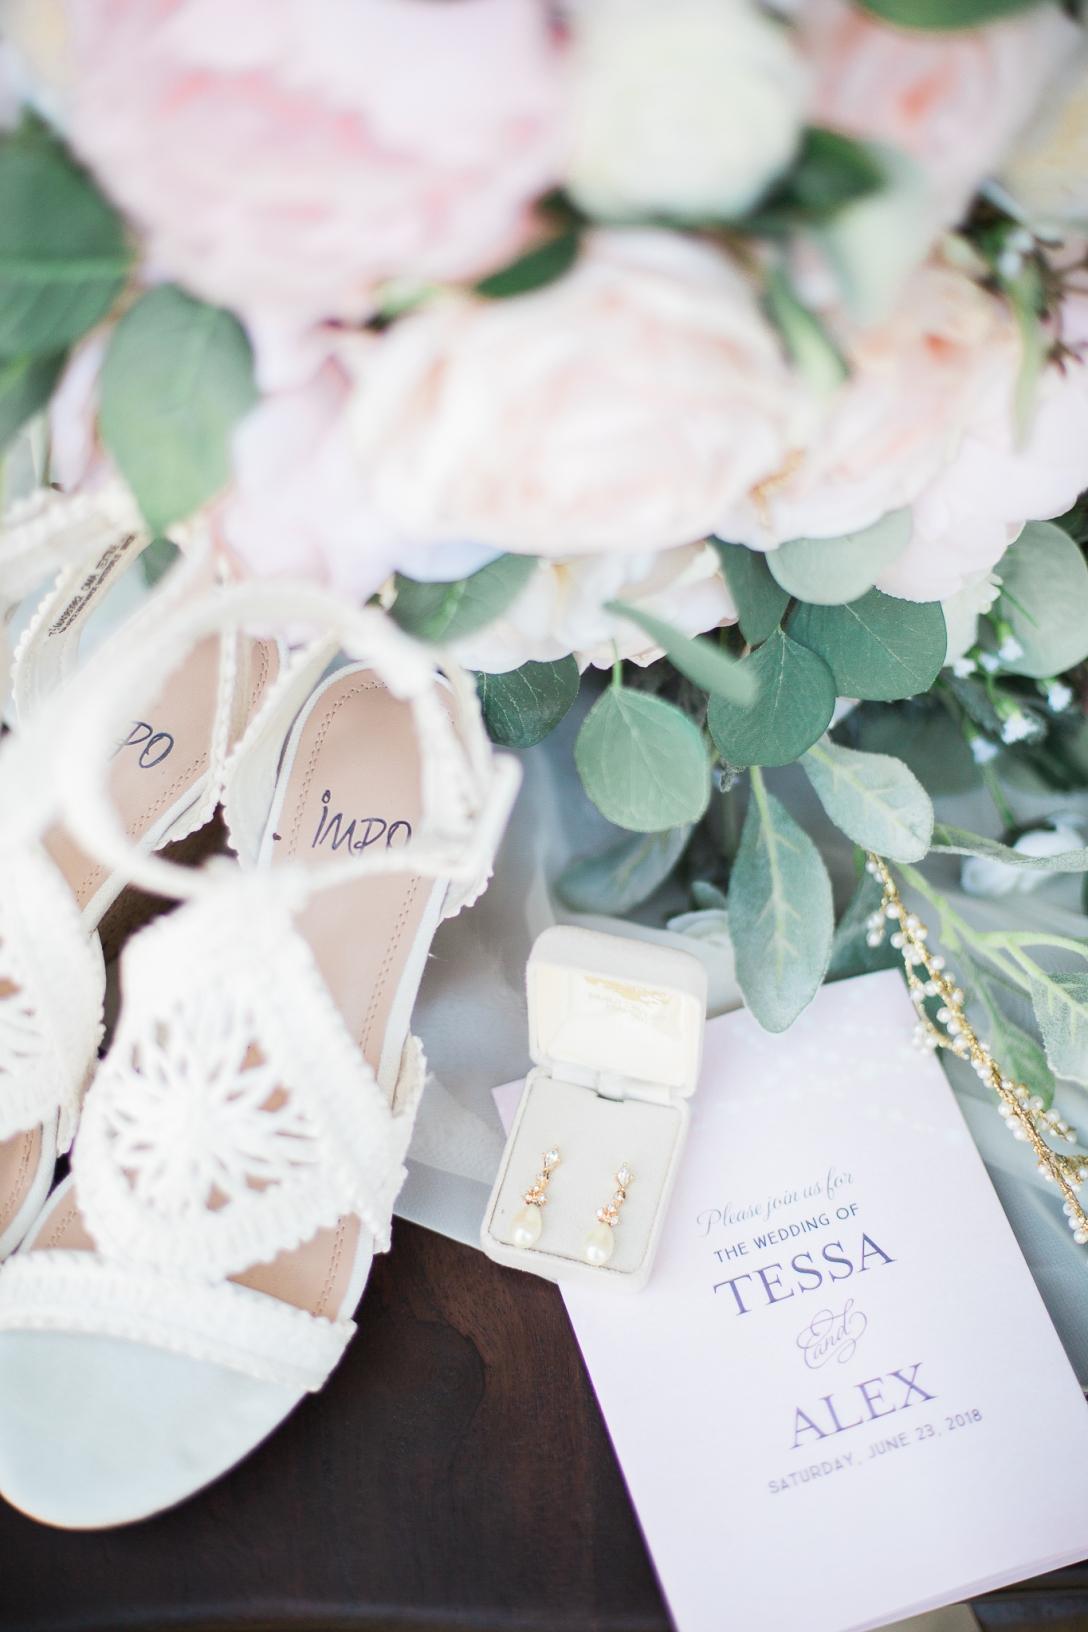 Tessa+Alex-Wedding-Tustin-California-WEB-2